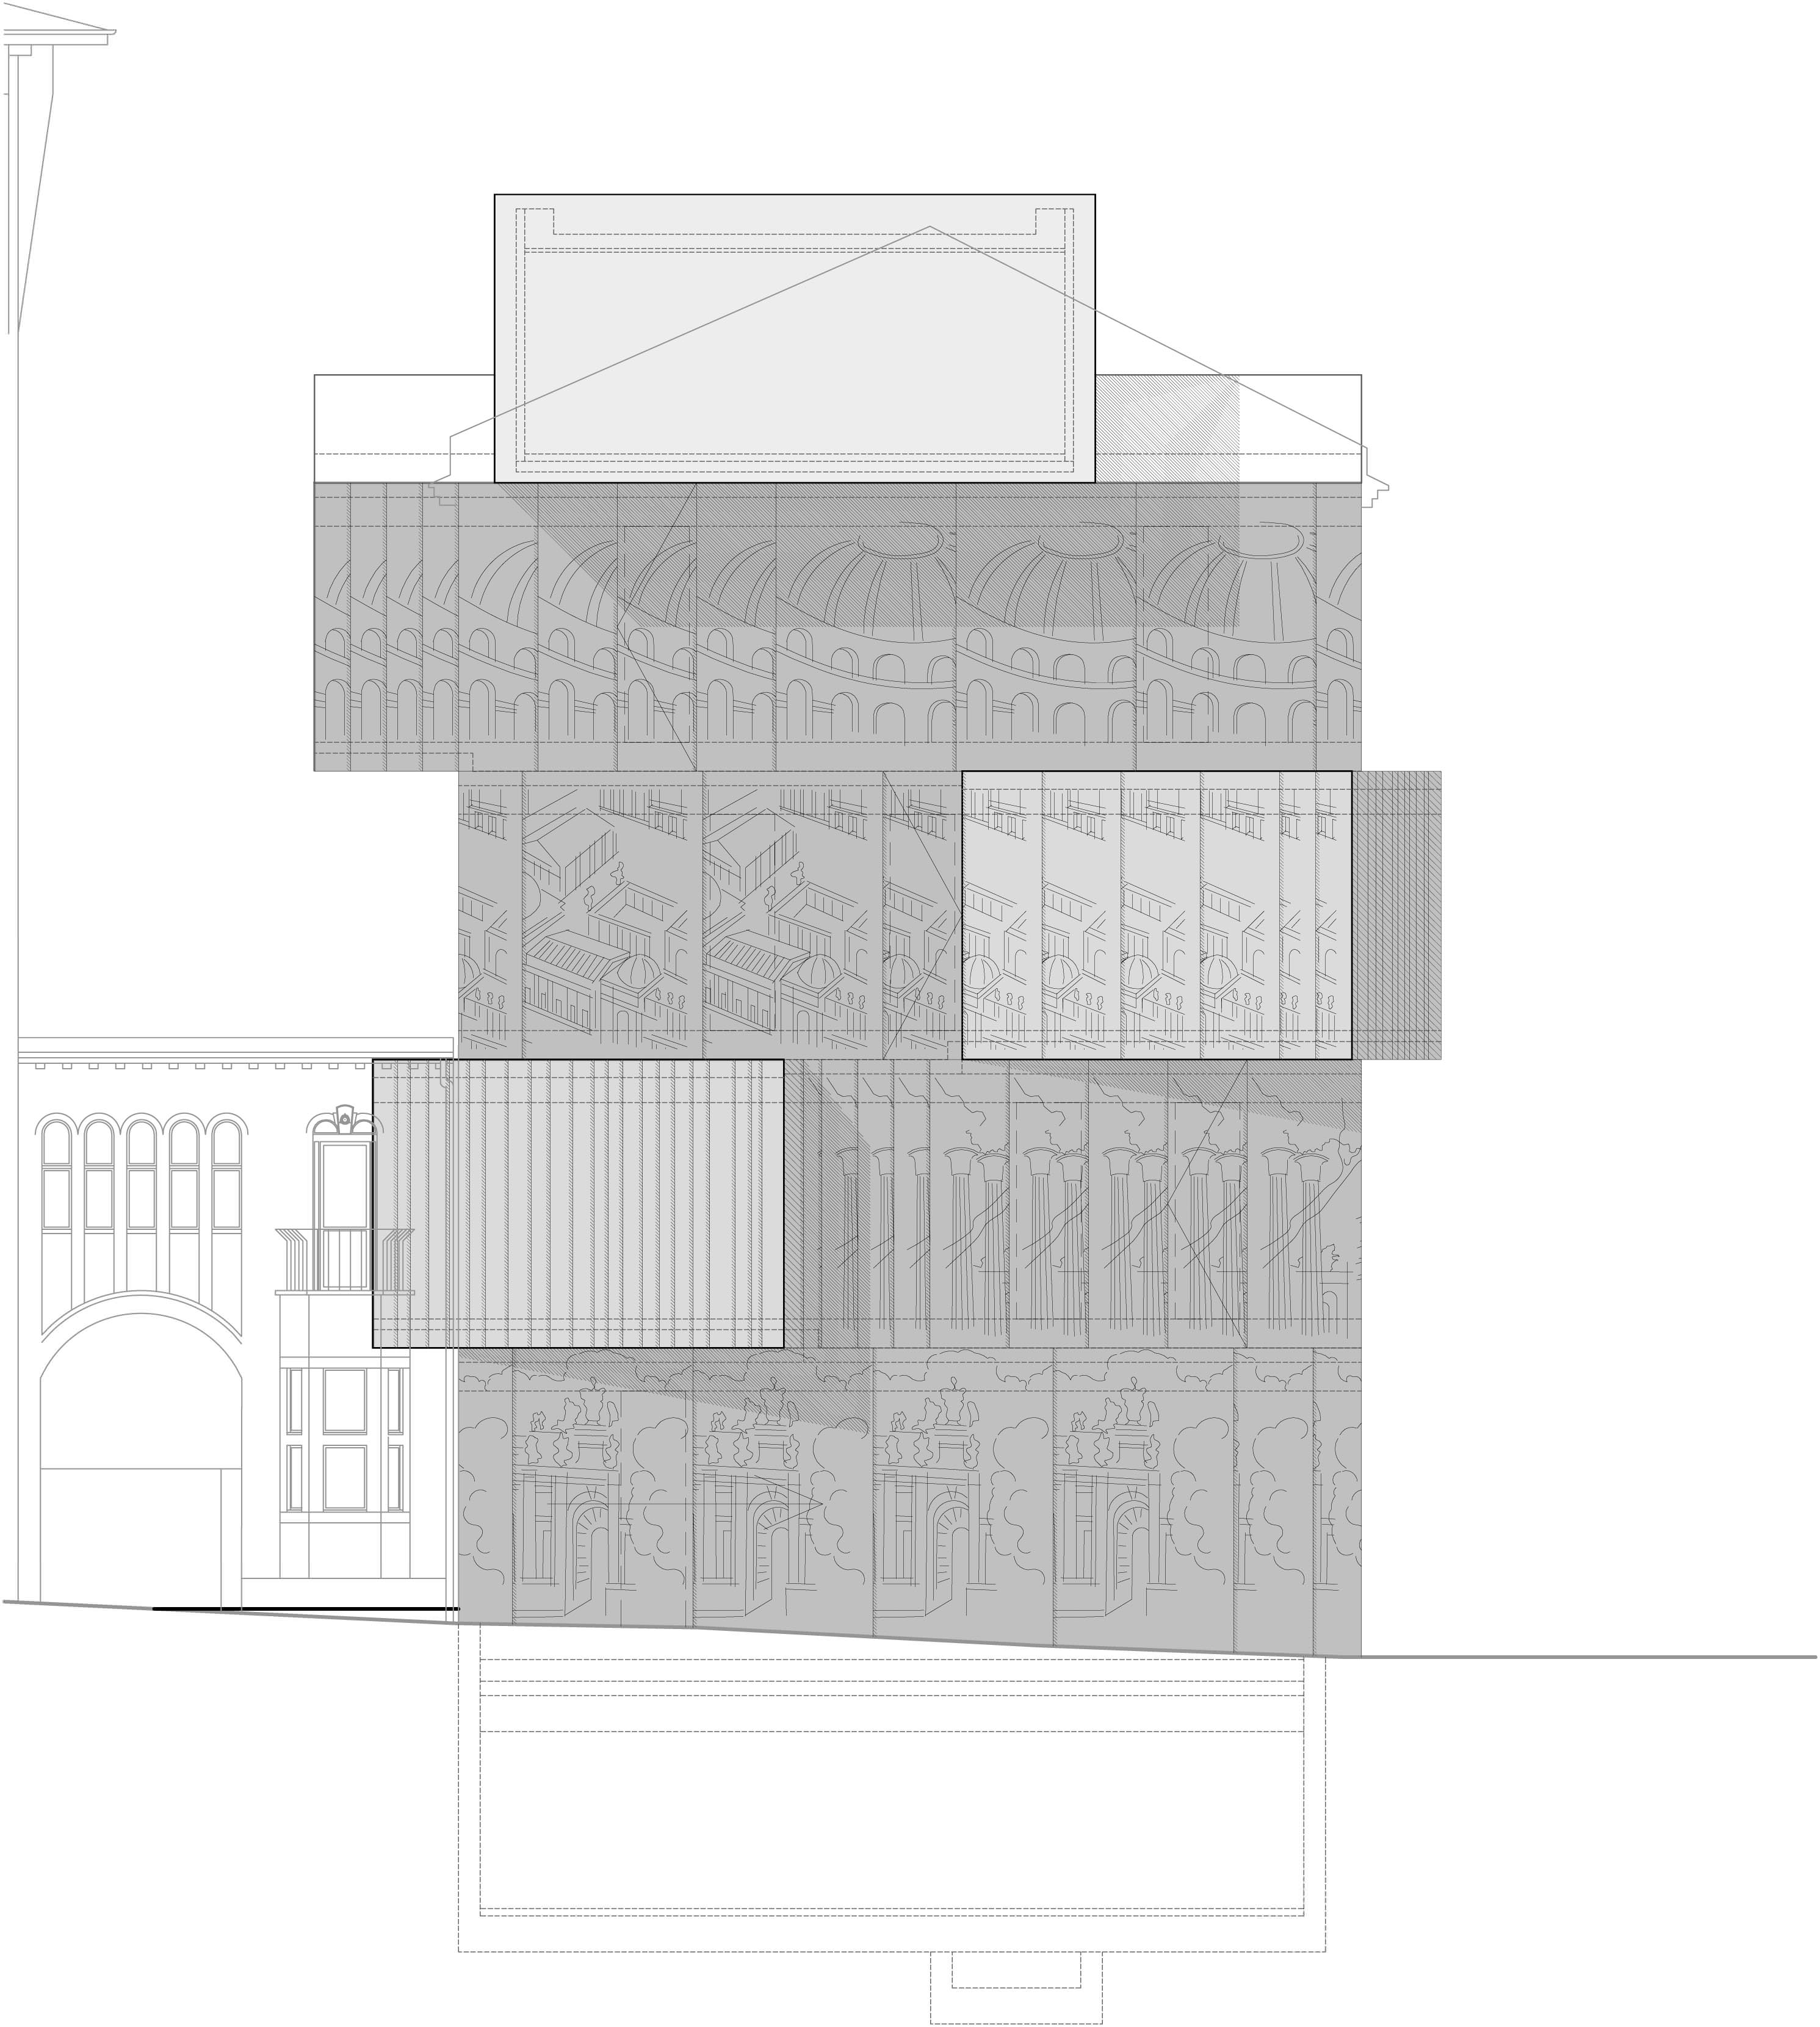 Slab Foundation Floor Plan Incredible living room list of things design